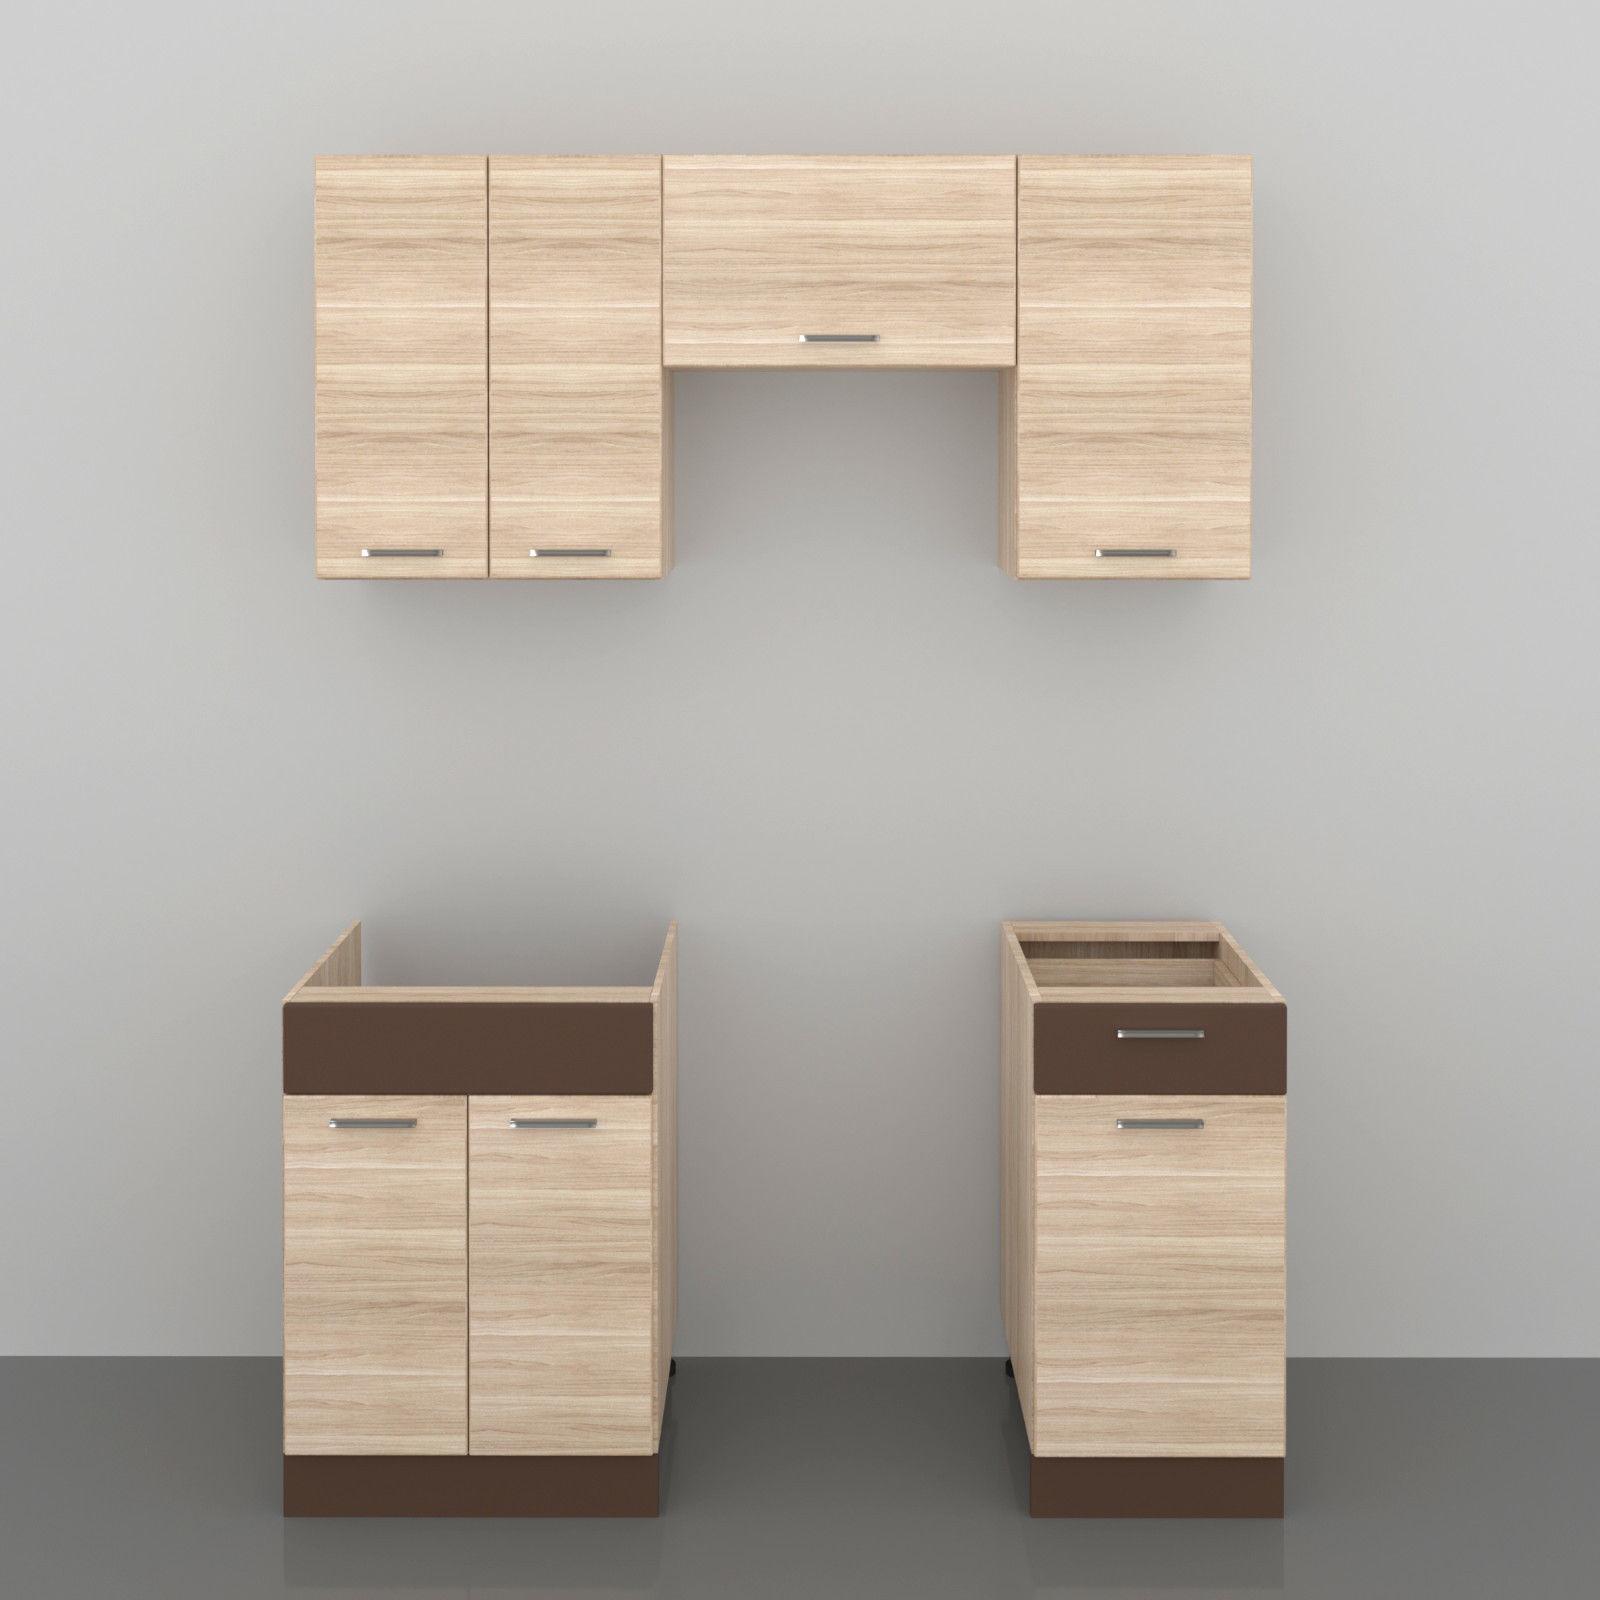 Küche ALINA 160 cm – Möbel DENA